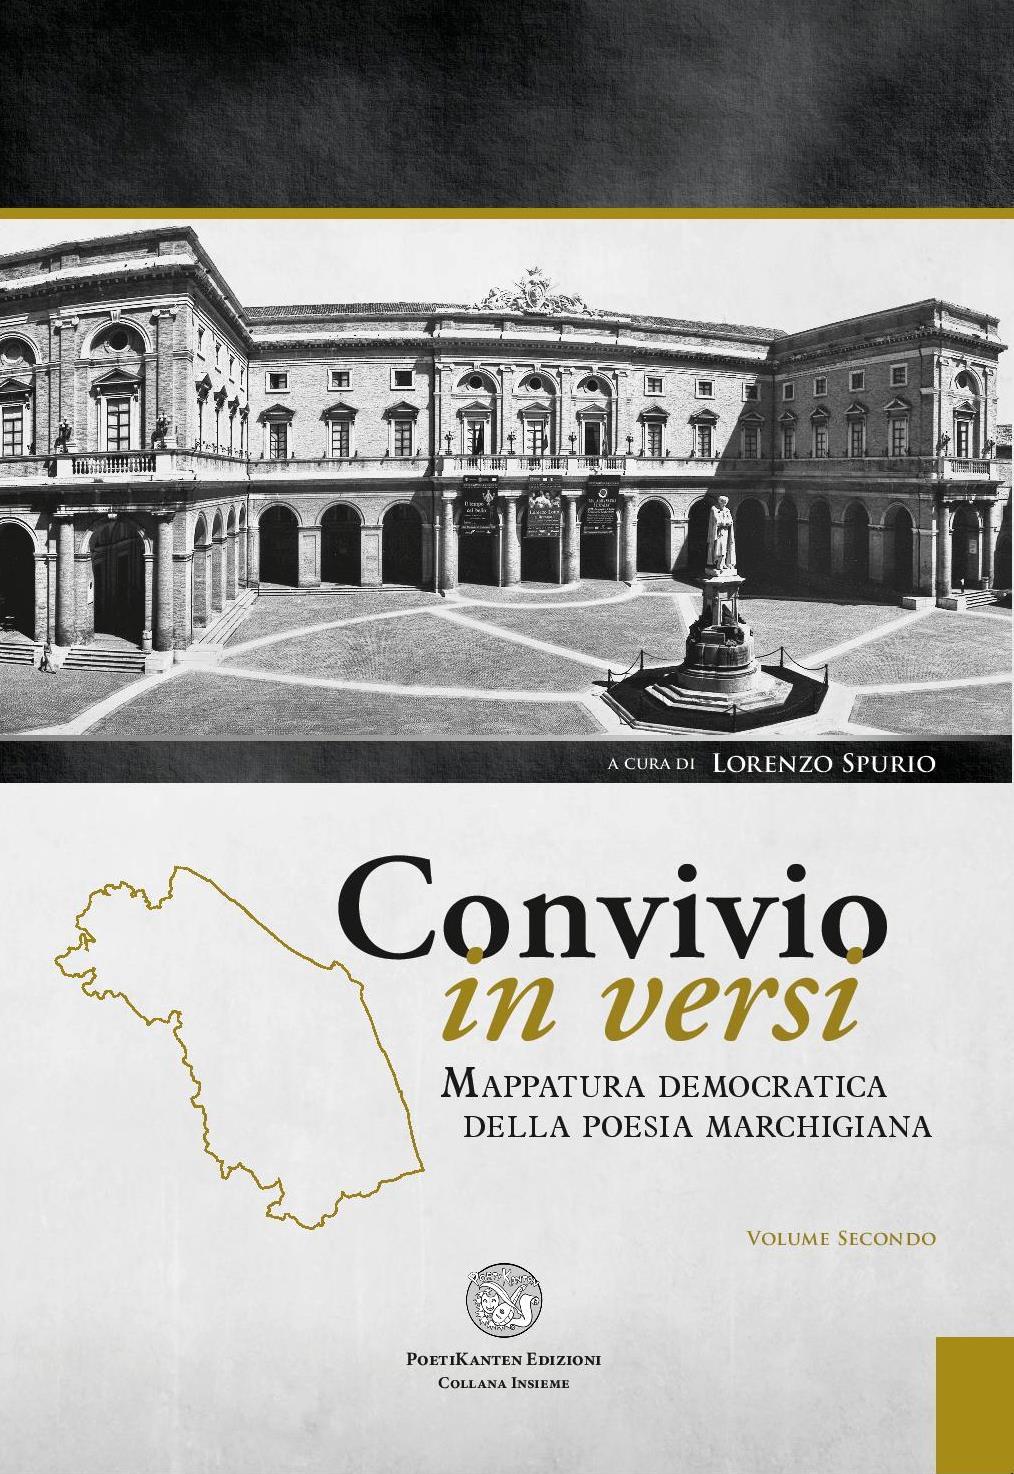 cover-vol2